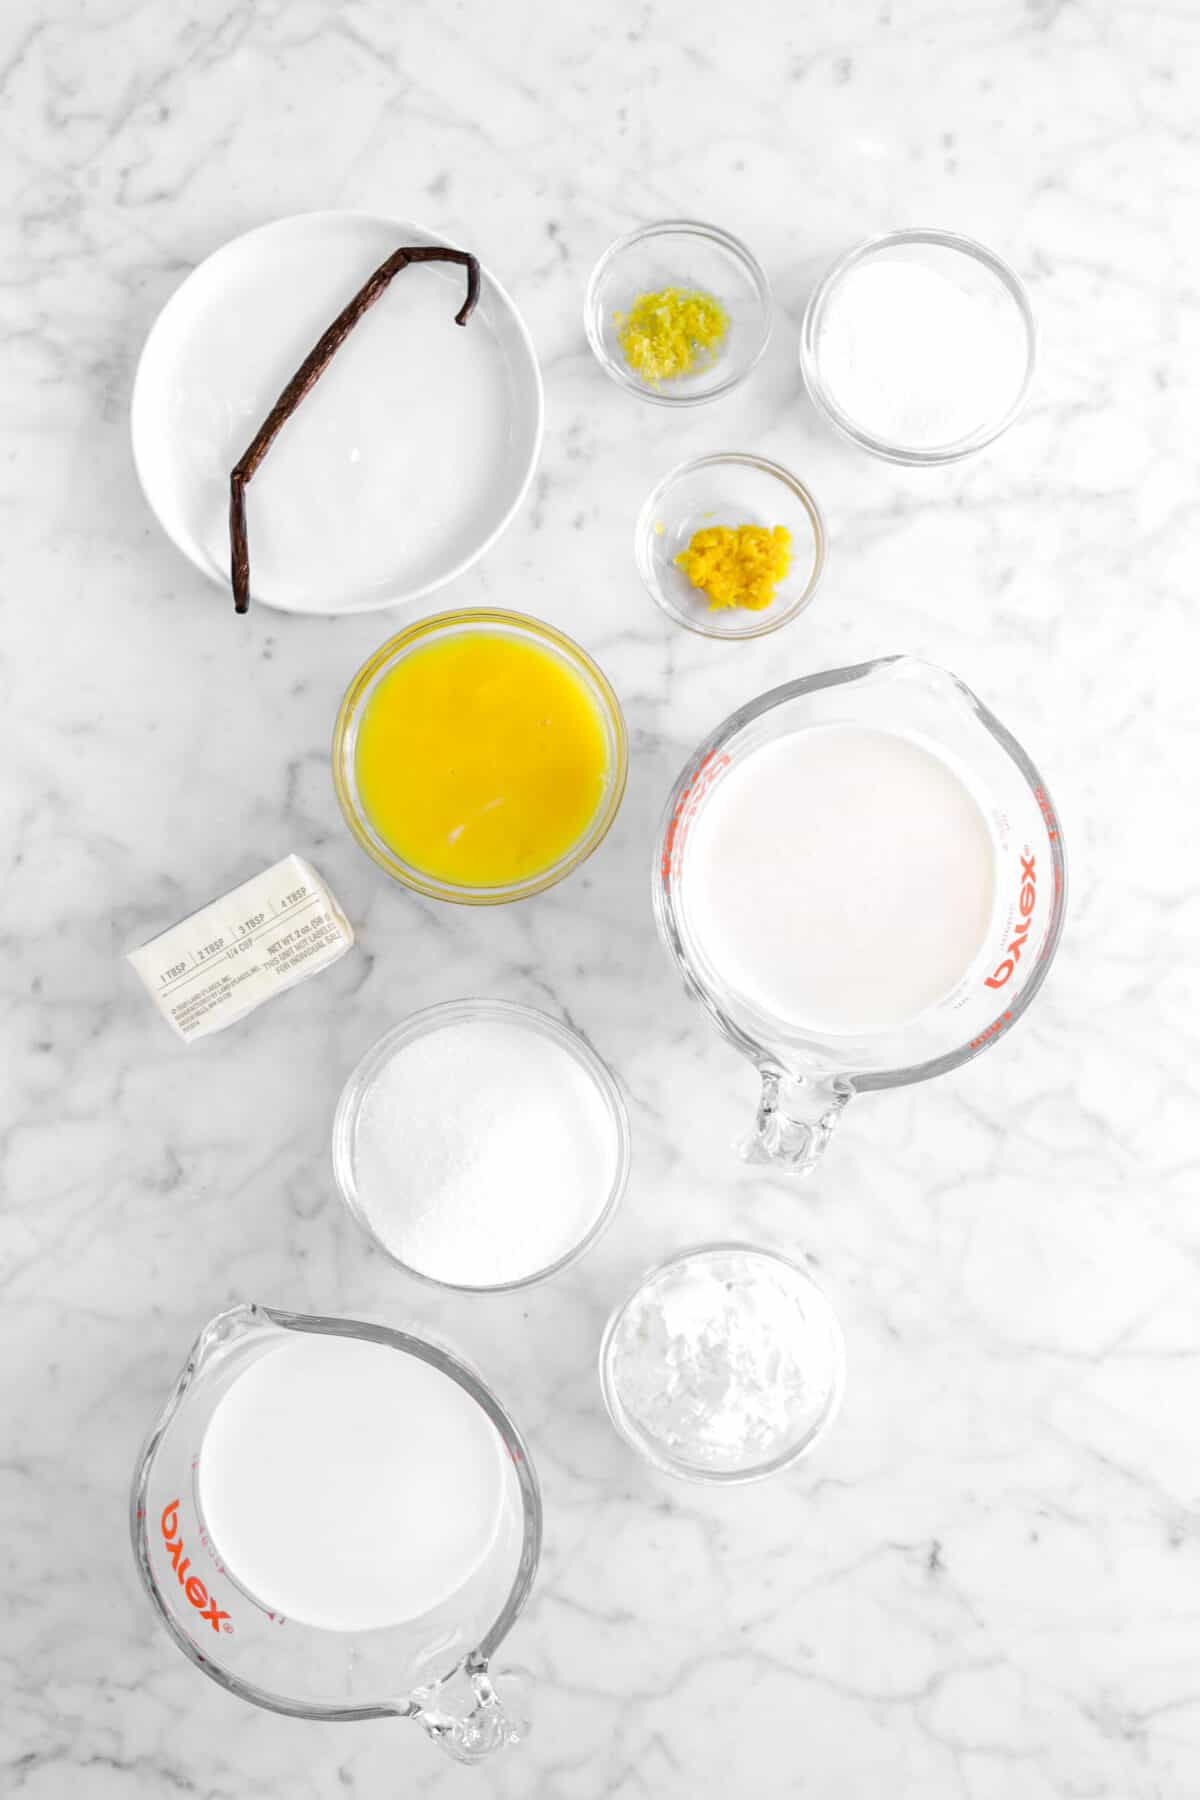 vanilla bean, orange zest, grapfruit zest, sugar, egg yolks, milk butter, corn start, and cream on marble counter